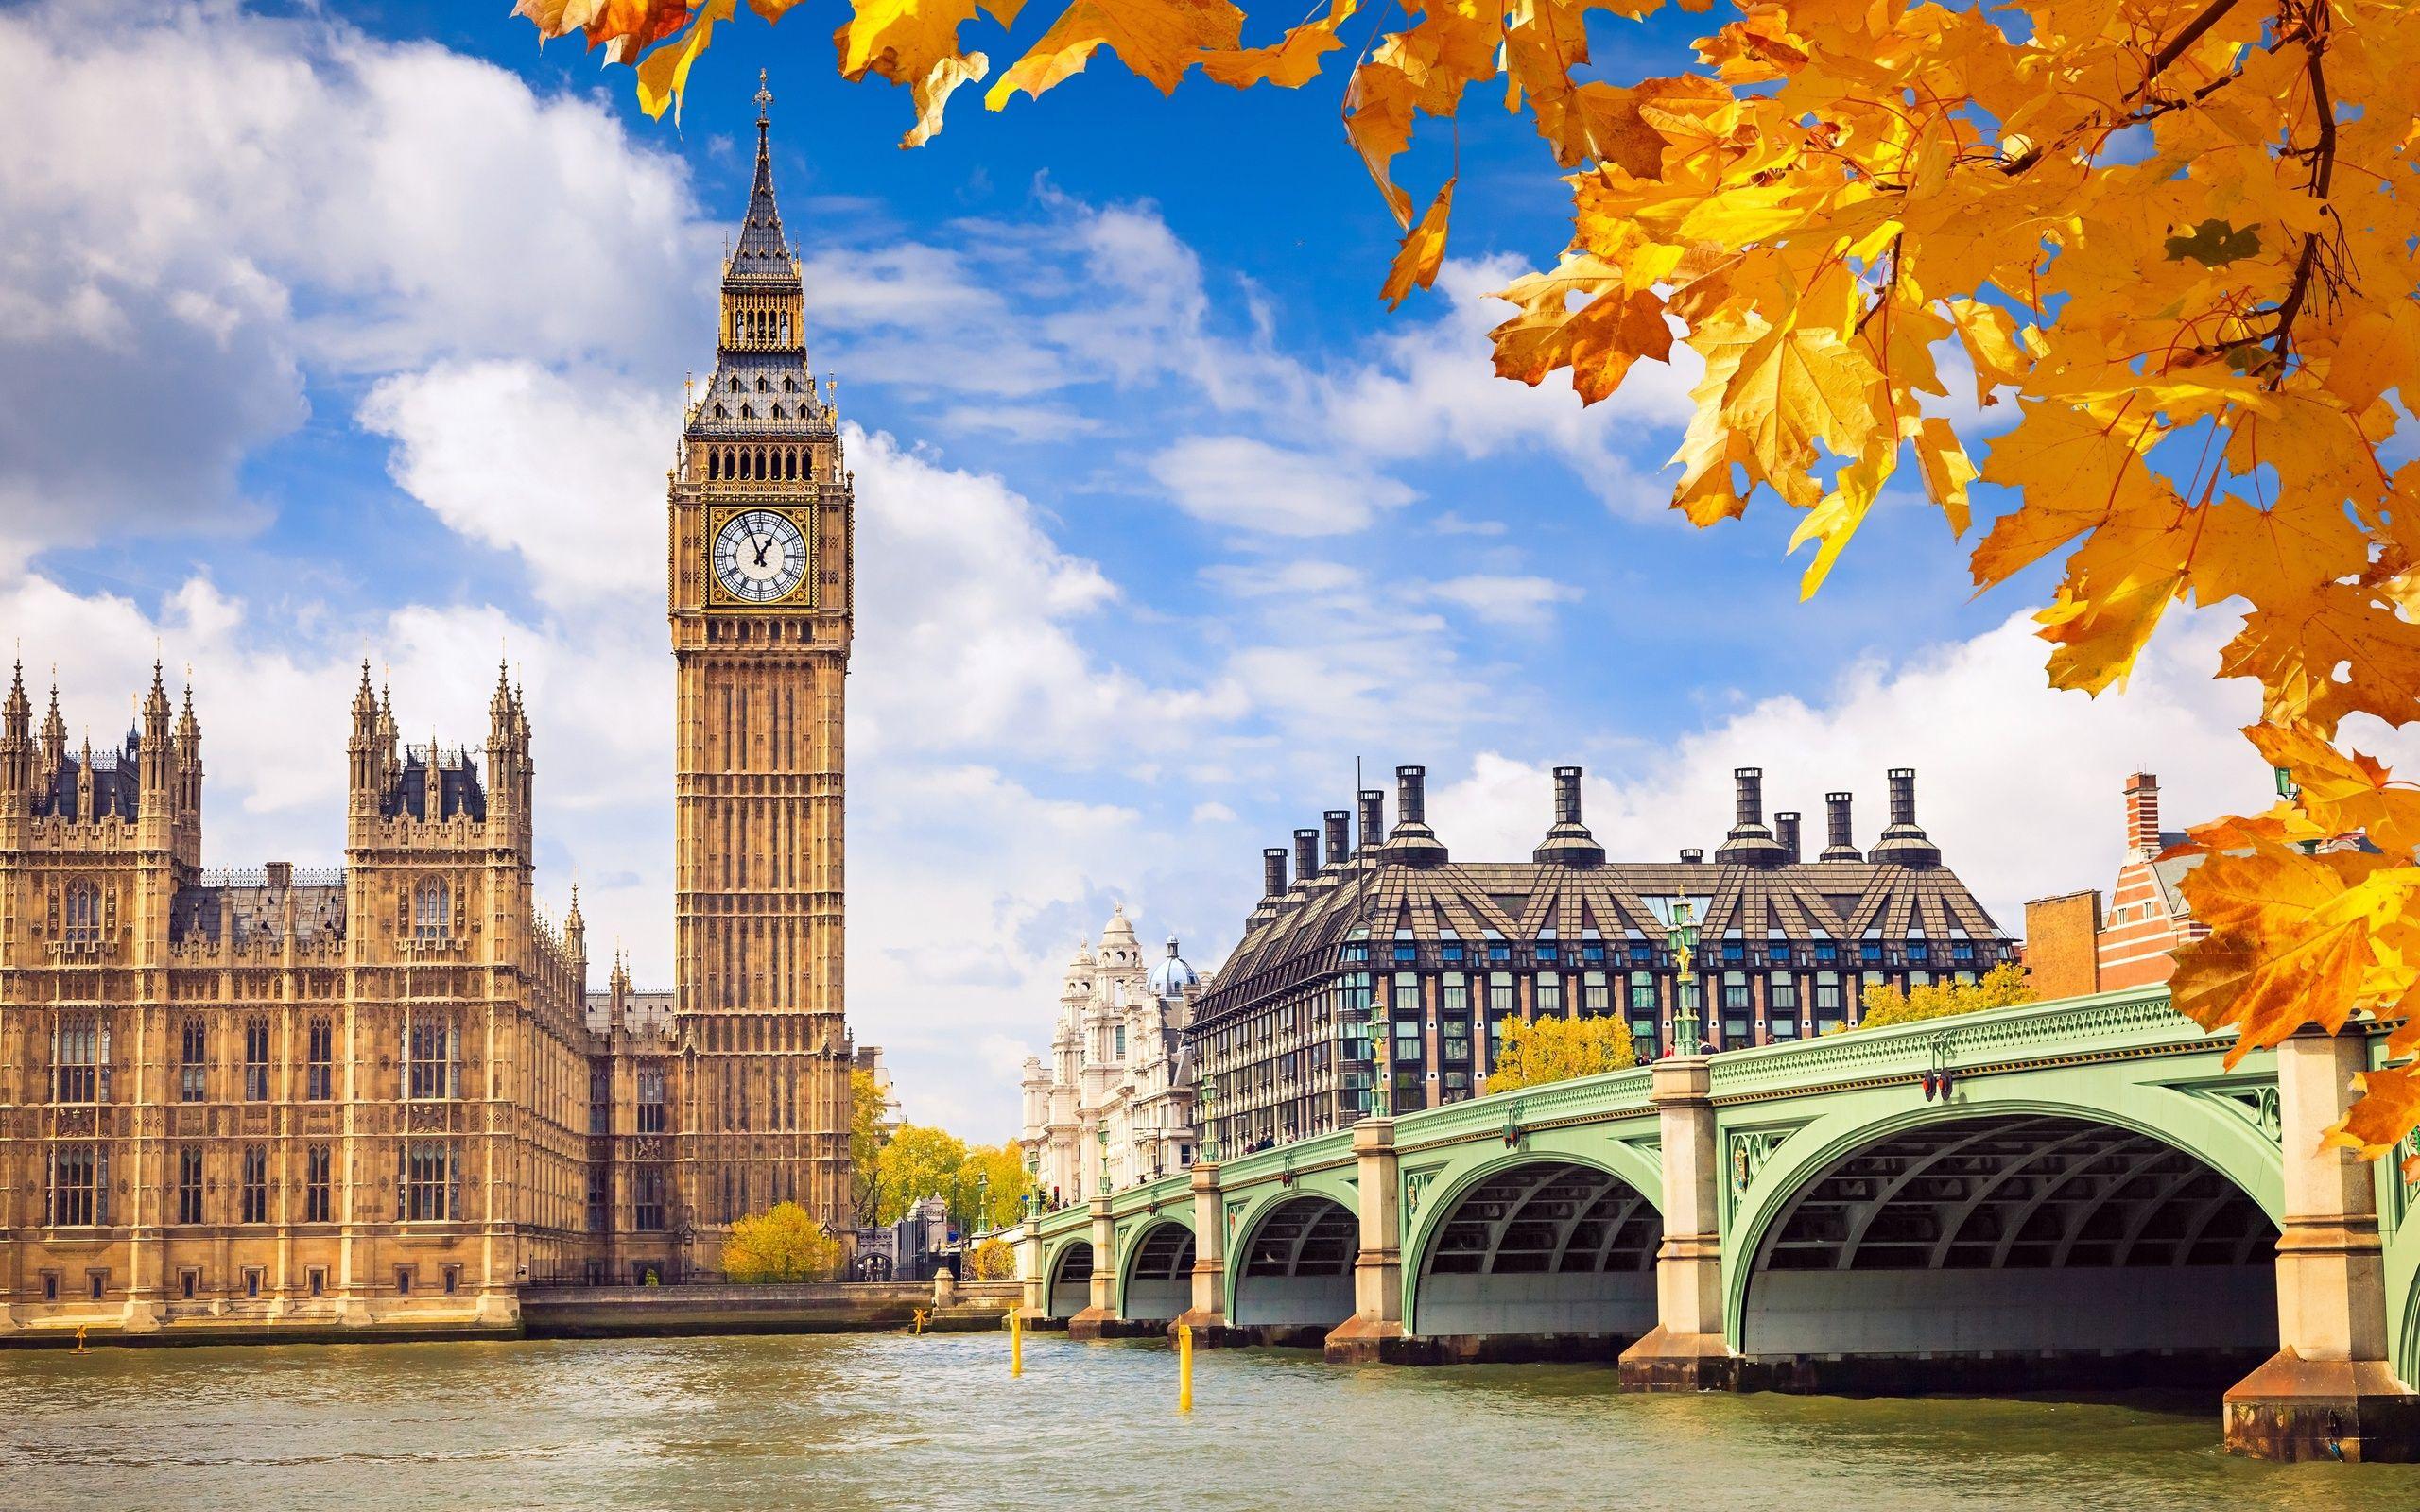 Big Ben London England Wallpapers   Top Big Ben London 2560x1600